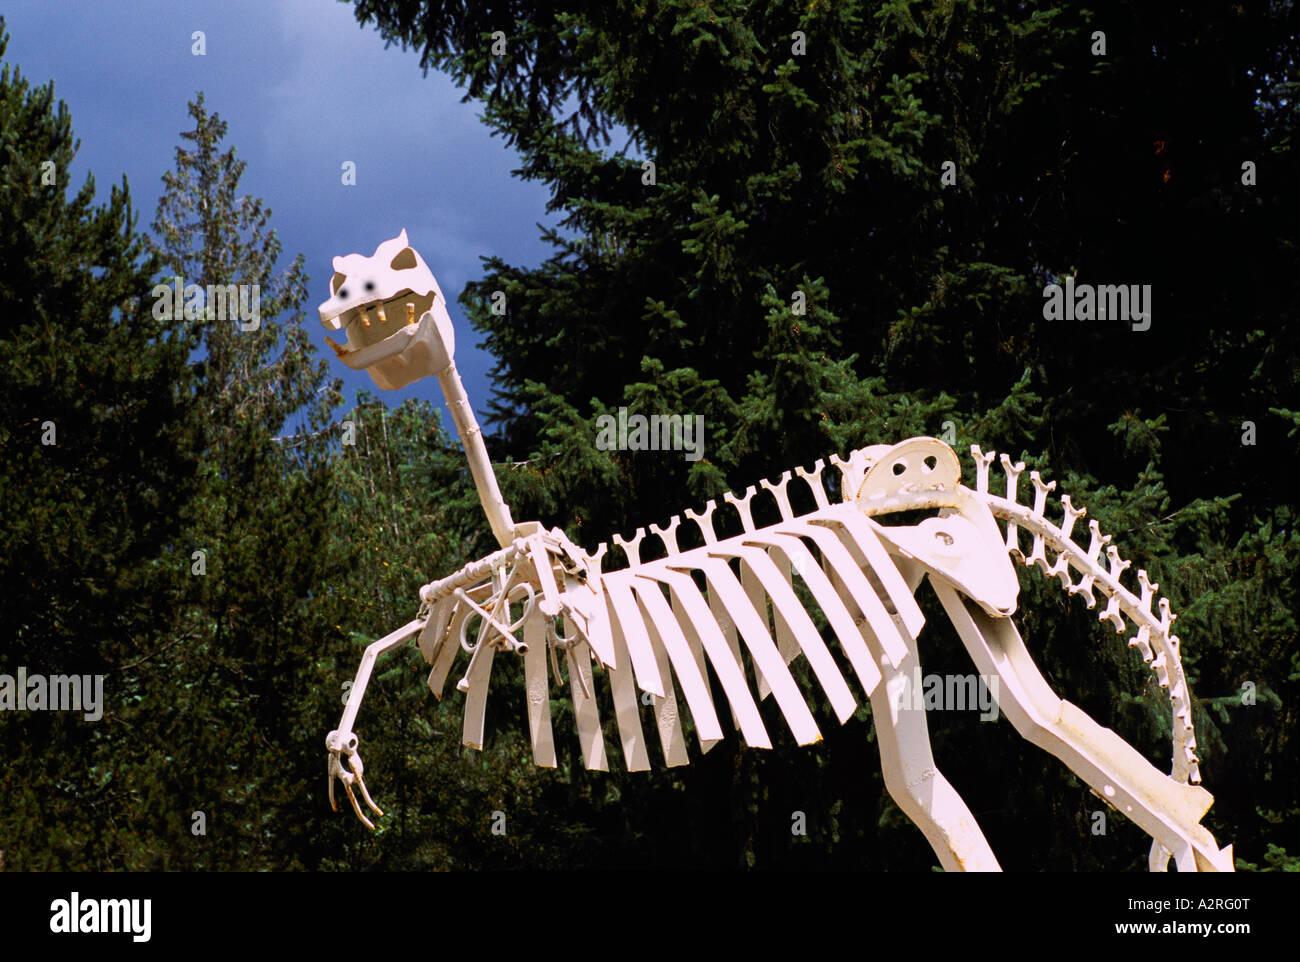 metal dinosaur stock photos metal dinosaur stock images alamy. Black Bedroom Furniture Sets. Home Design Ideas